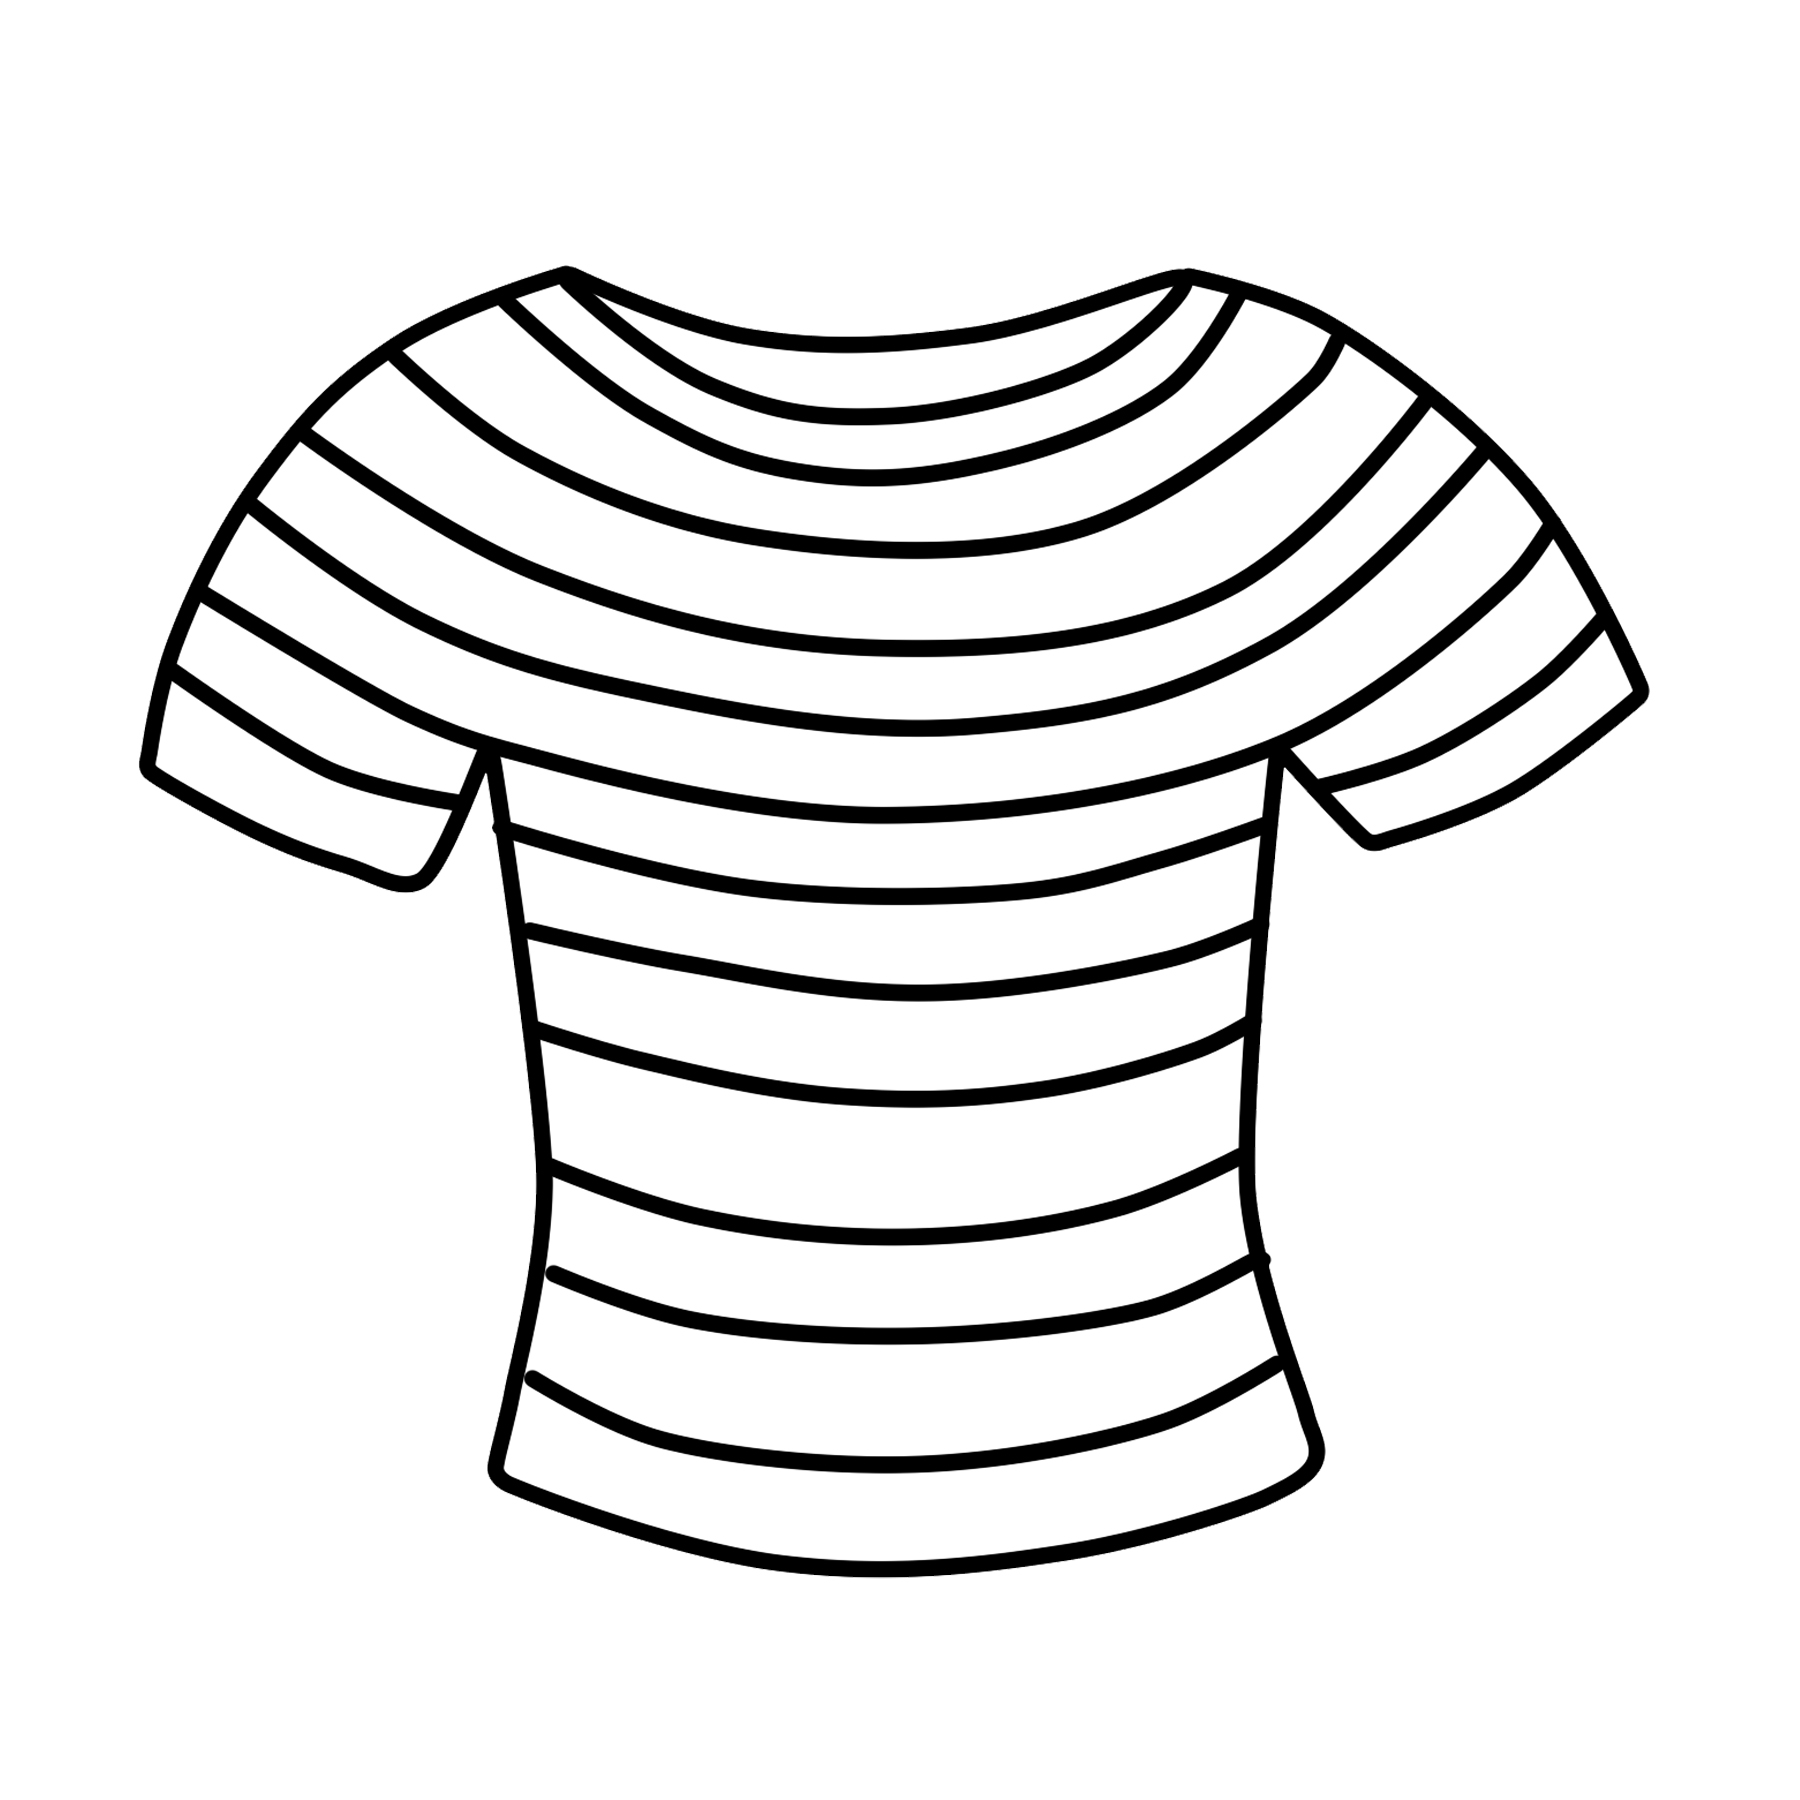 20 Striped Spots Clip Art Ideas And Designs